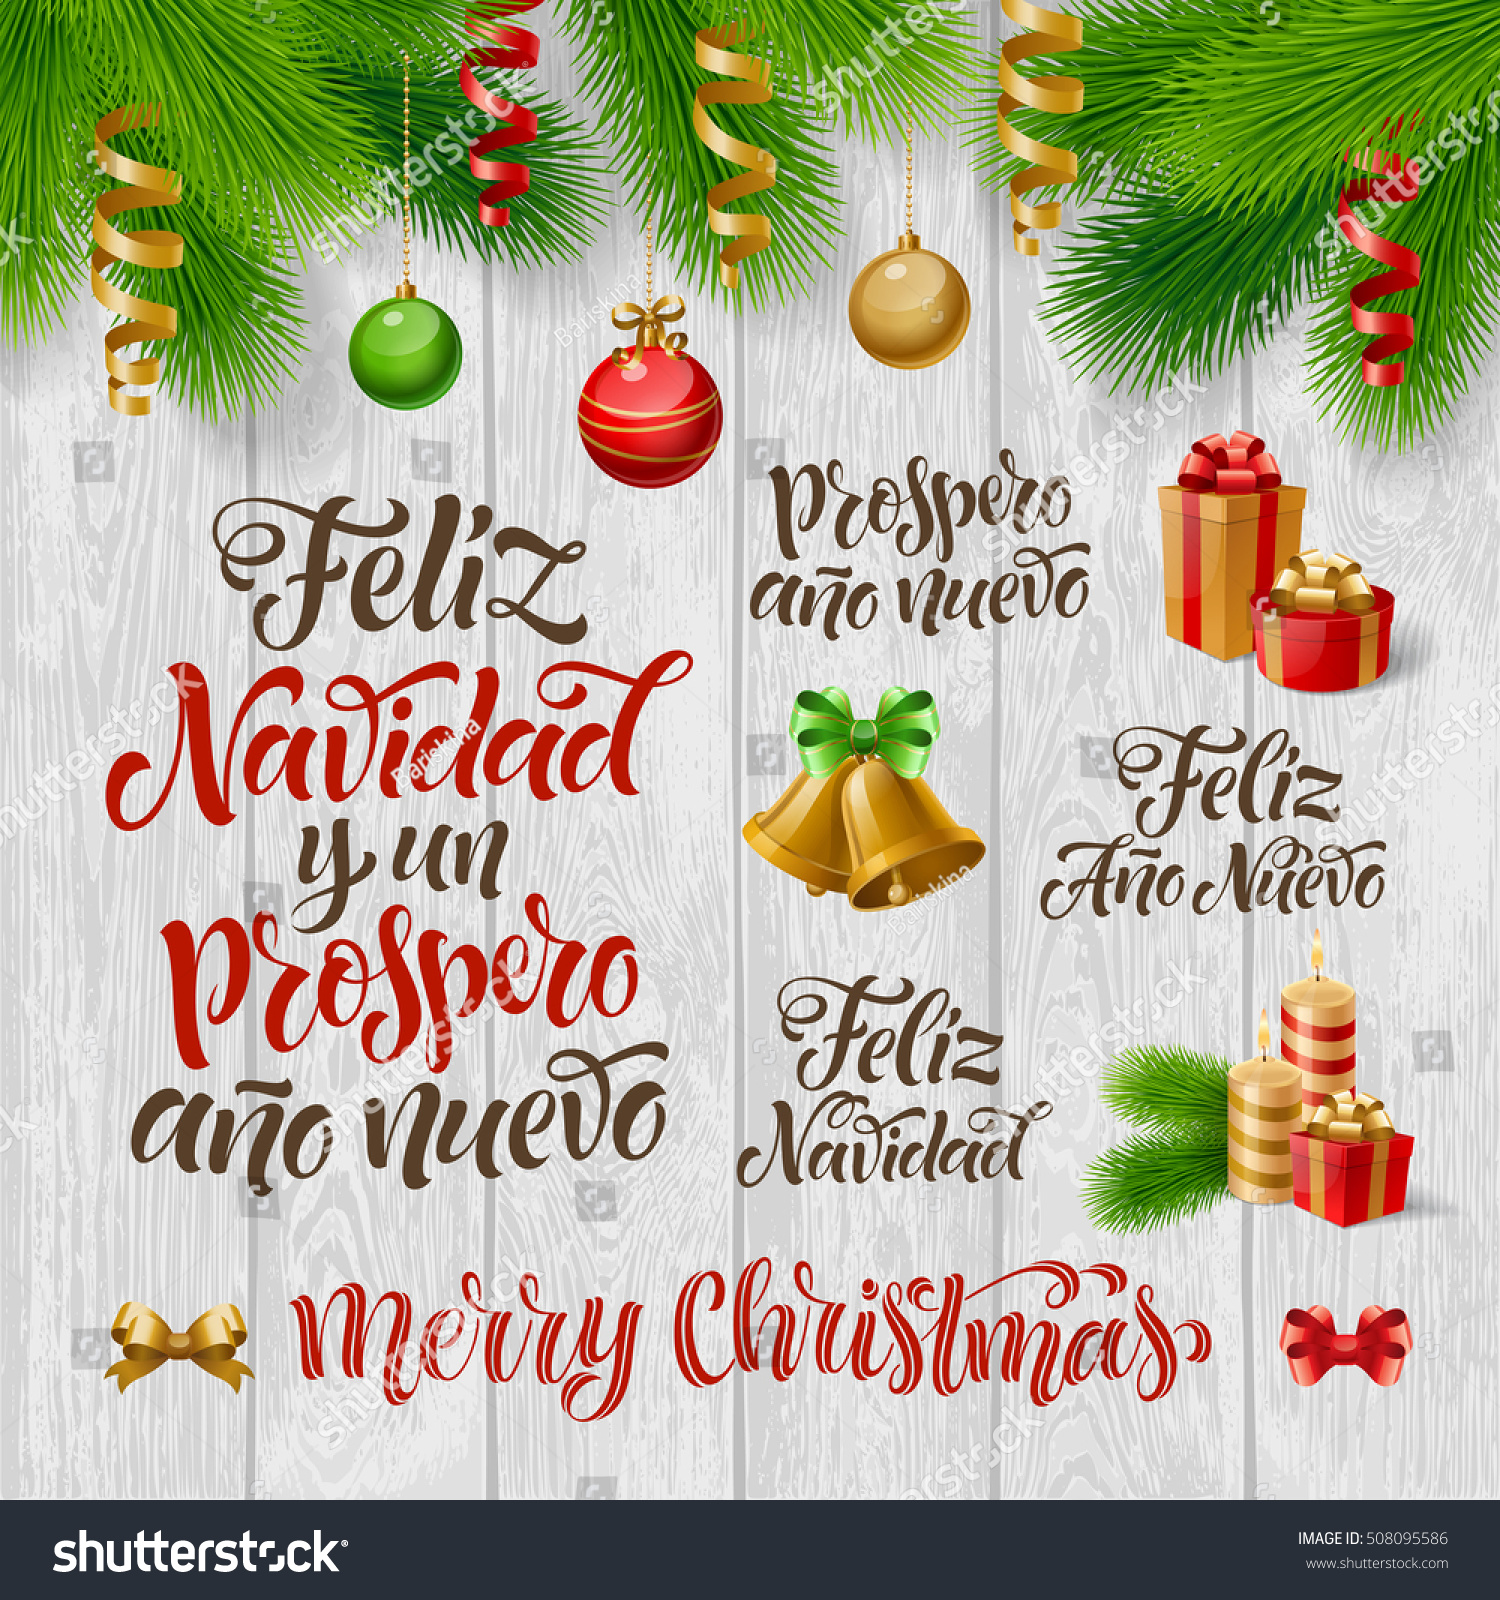 Feliz Navidad Cristmas.Vector Spanish Merry Christmas Happy New Stock Vector